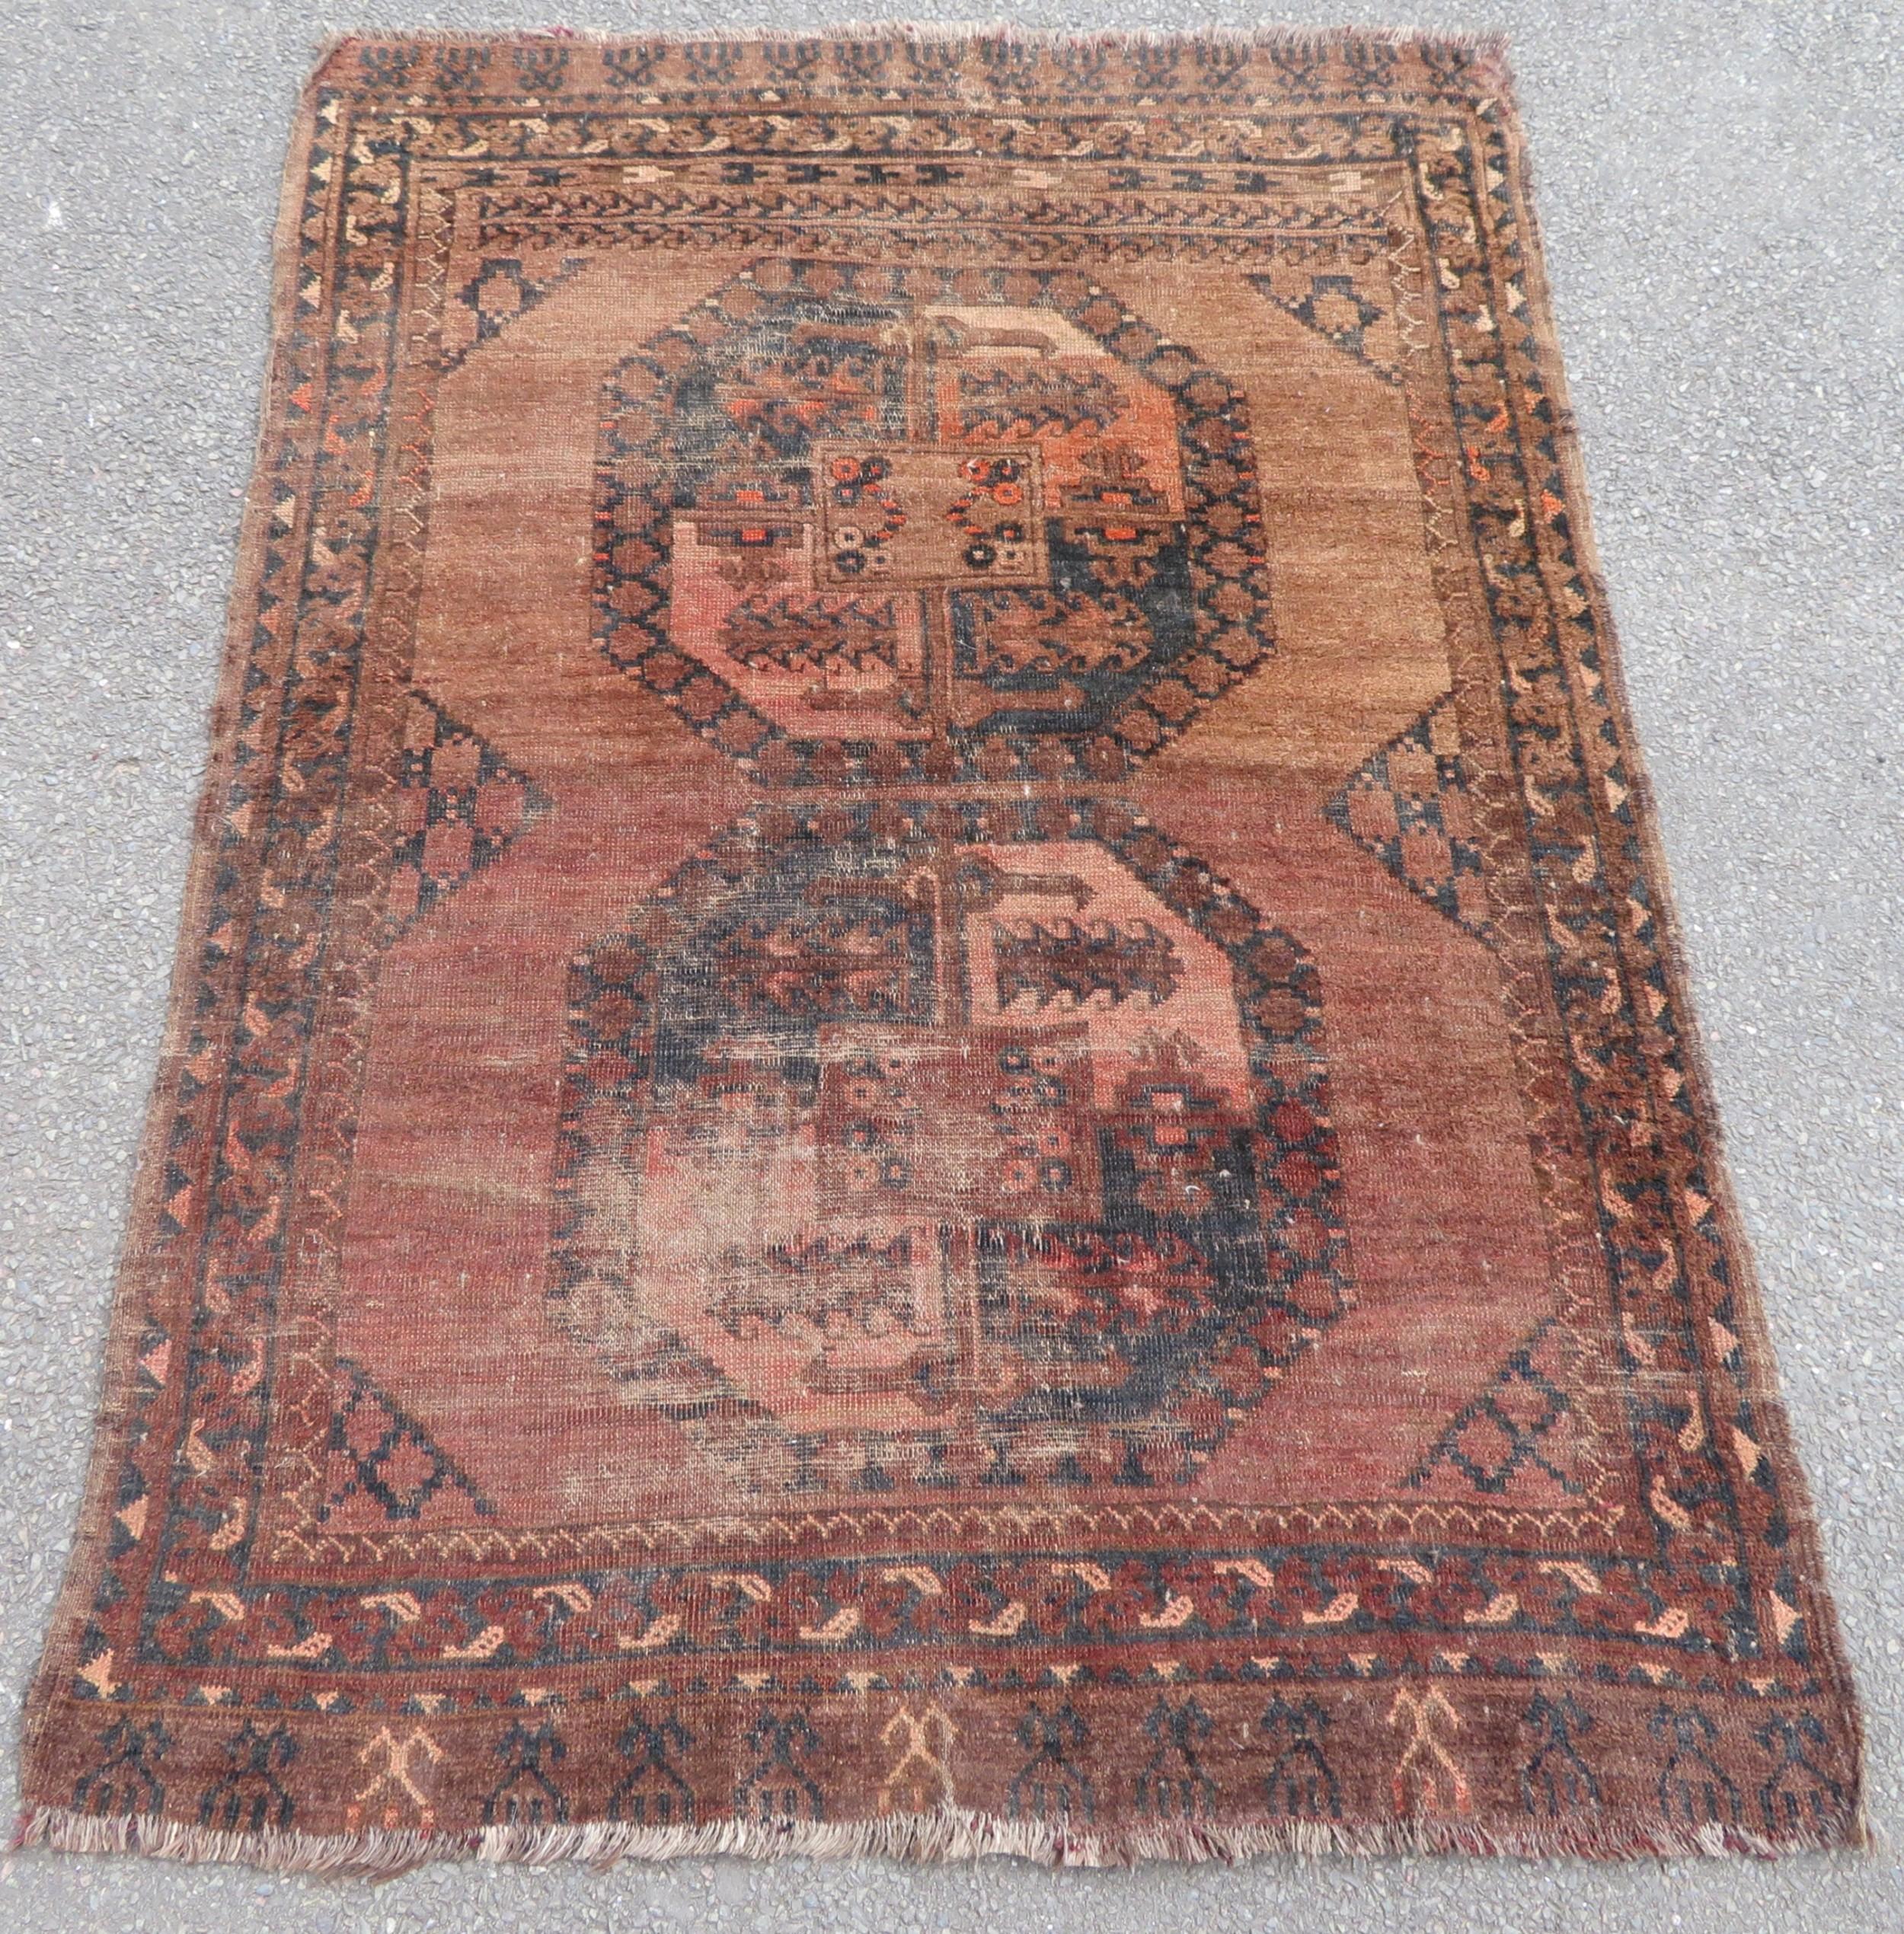 antique country house shabby chic afghan ersari turkmen rug